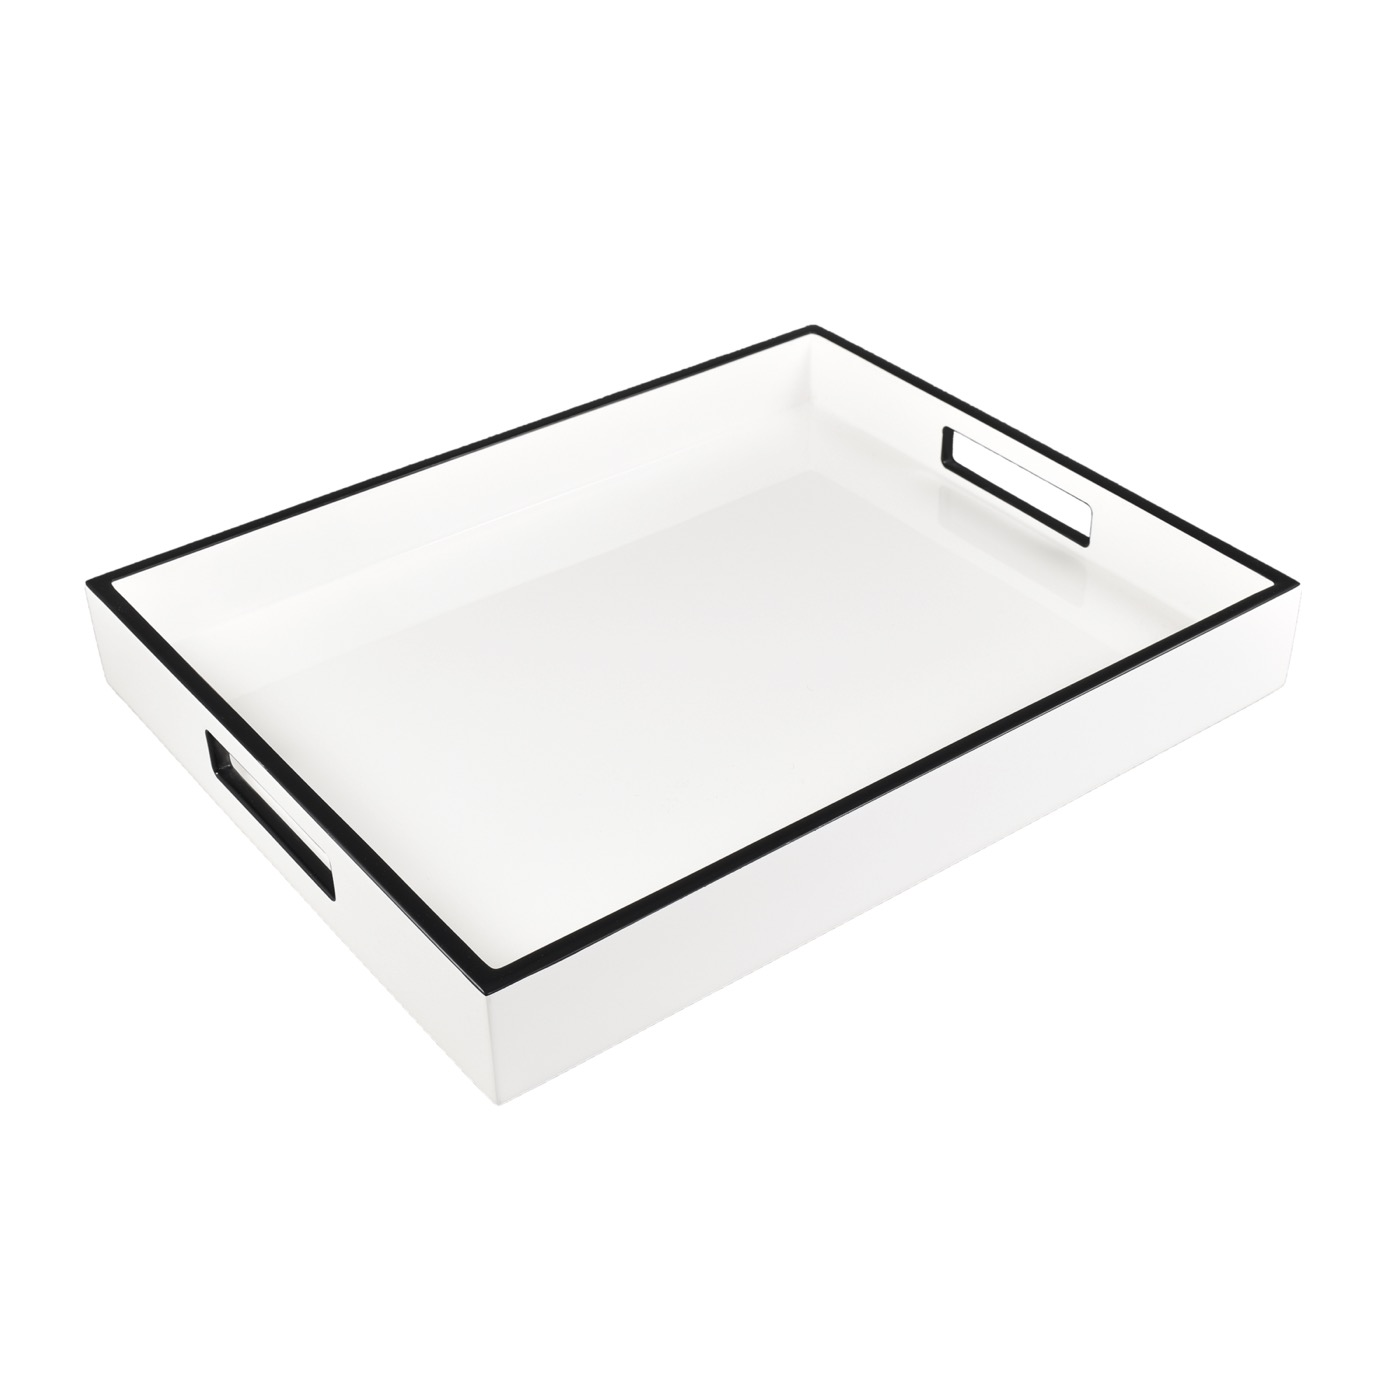 Ellie Rectangular Lacquered Trays | White w/Black Trim